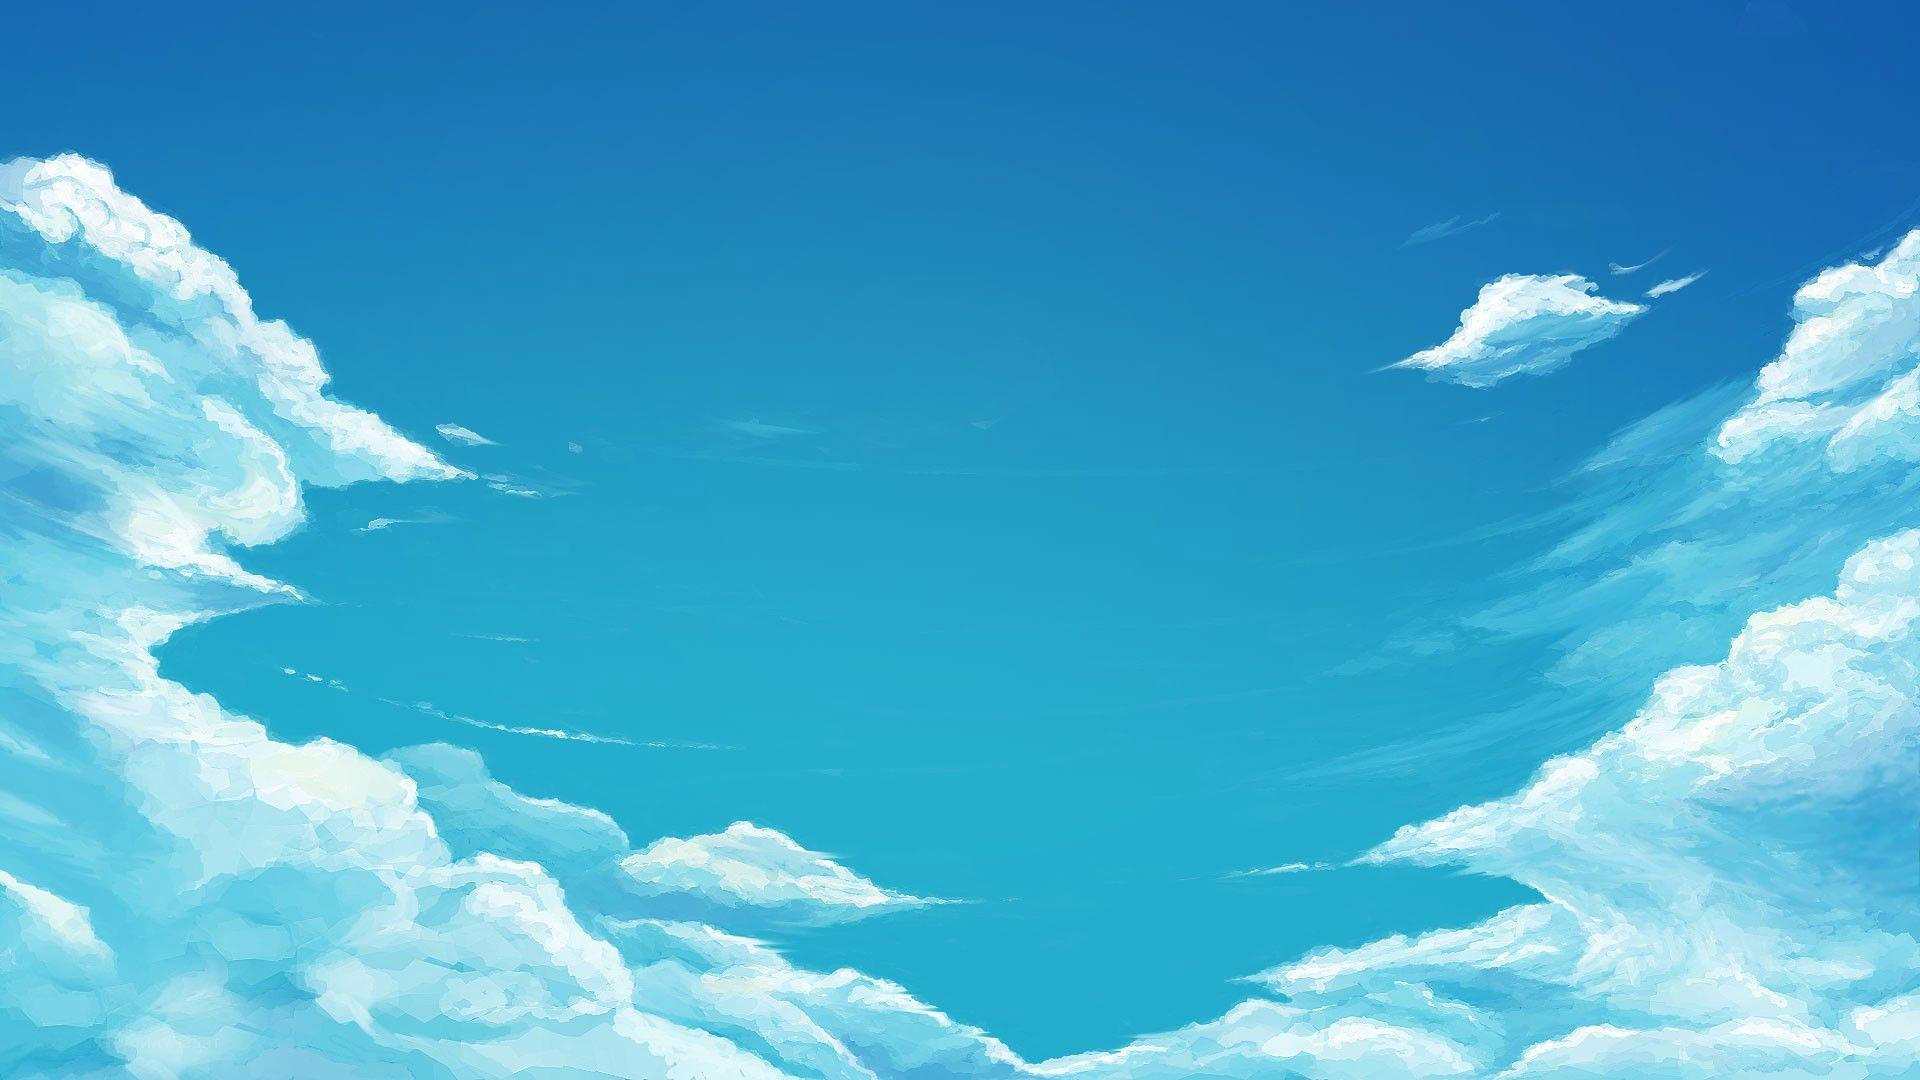 Blue Sky Wallpaper Background - WallpaperSafari